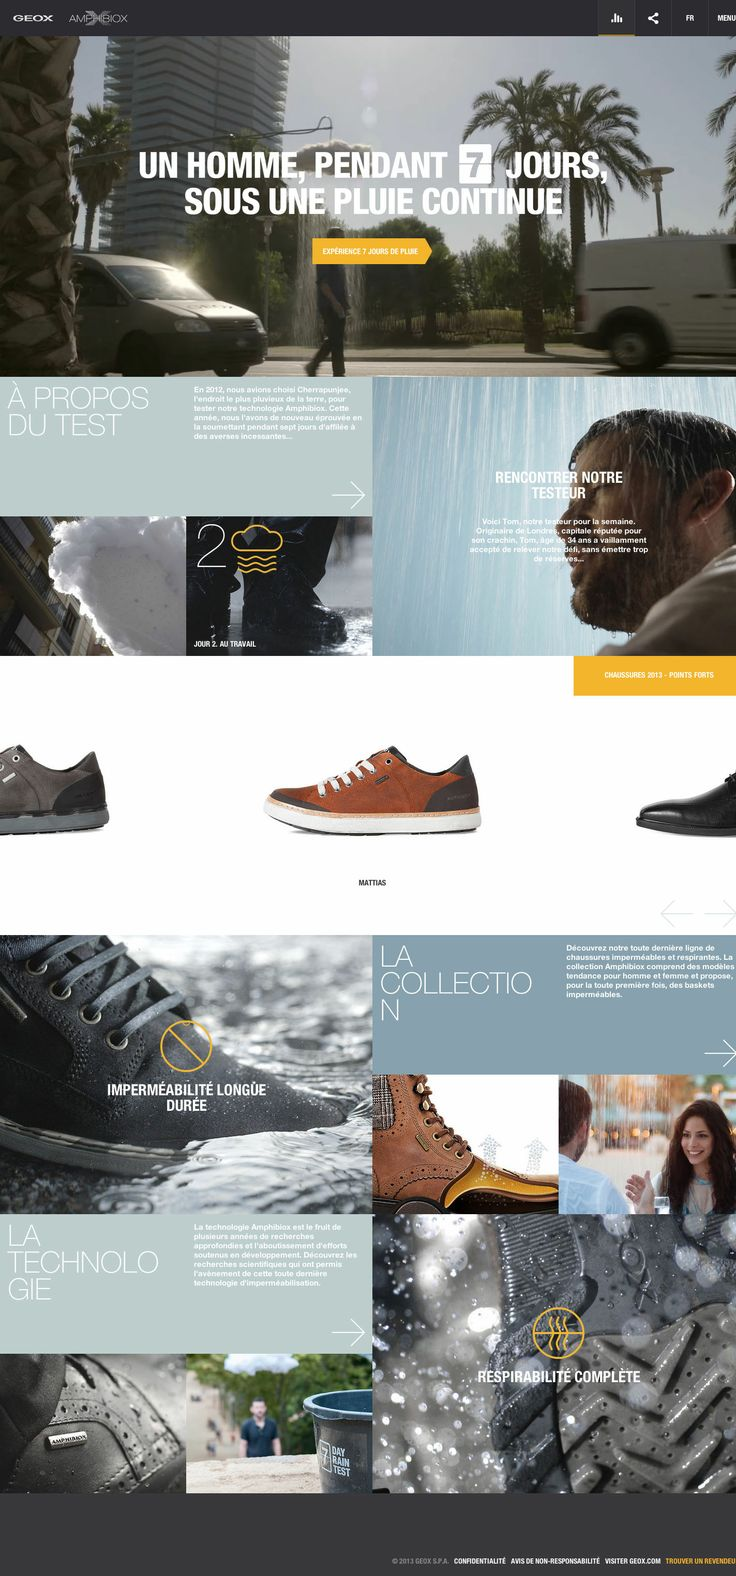 Geox - Amphibiox \\ Beautiful website & cool grid. http://amphibiox.geox.com/amphibiox2013